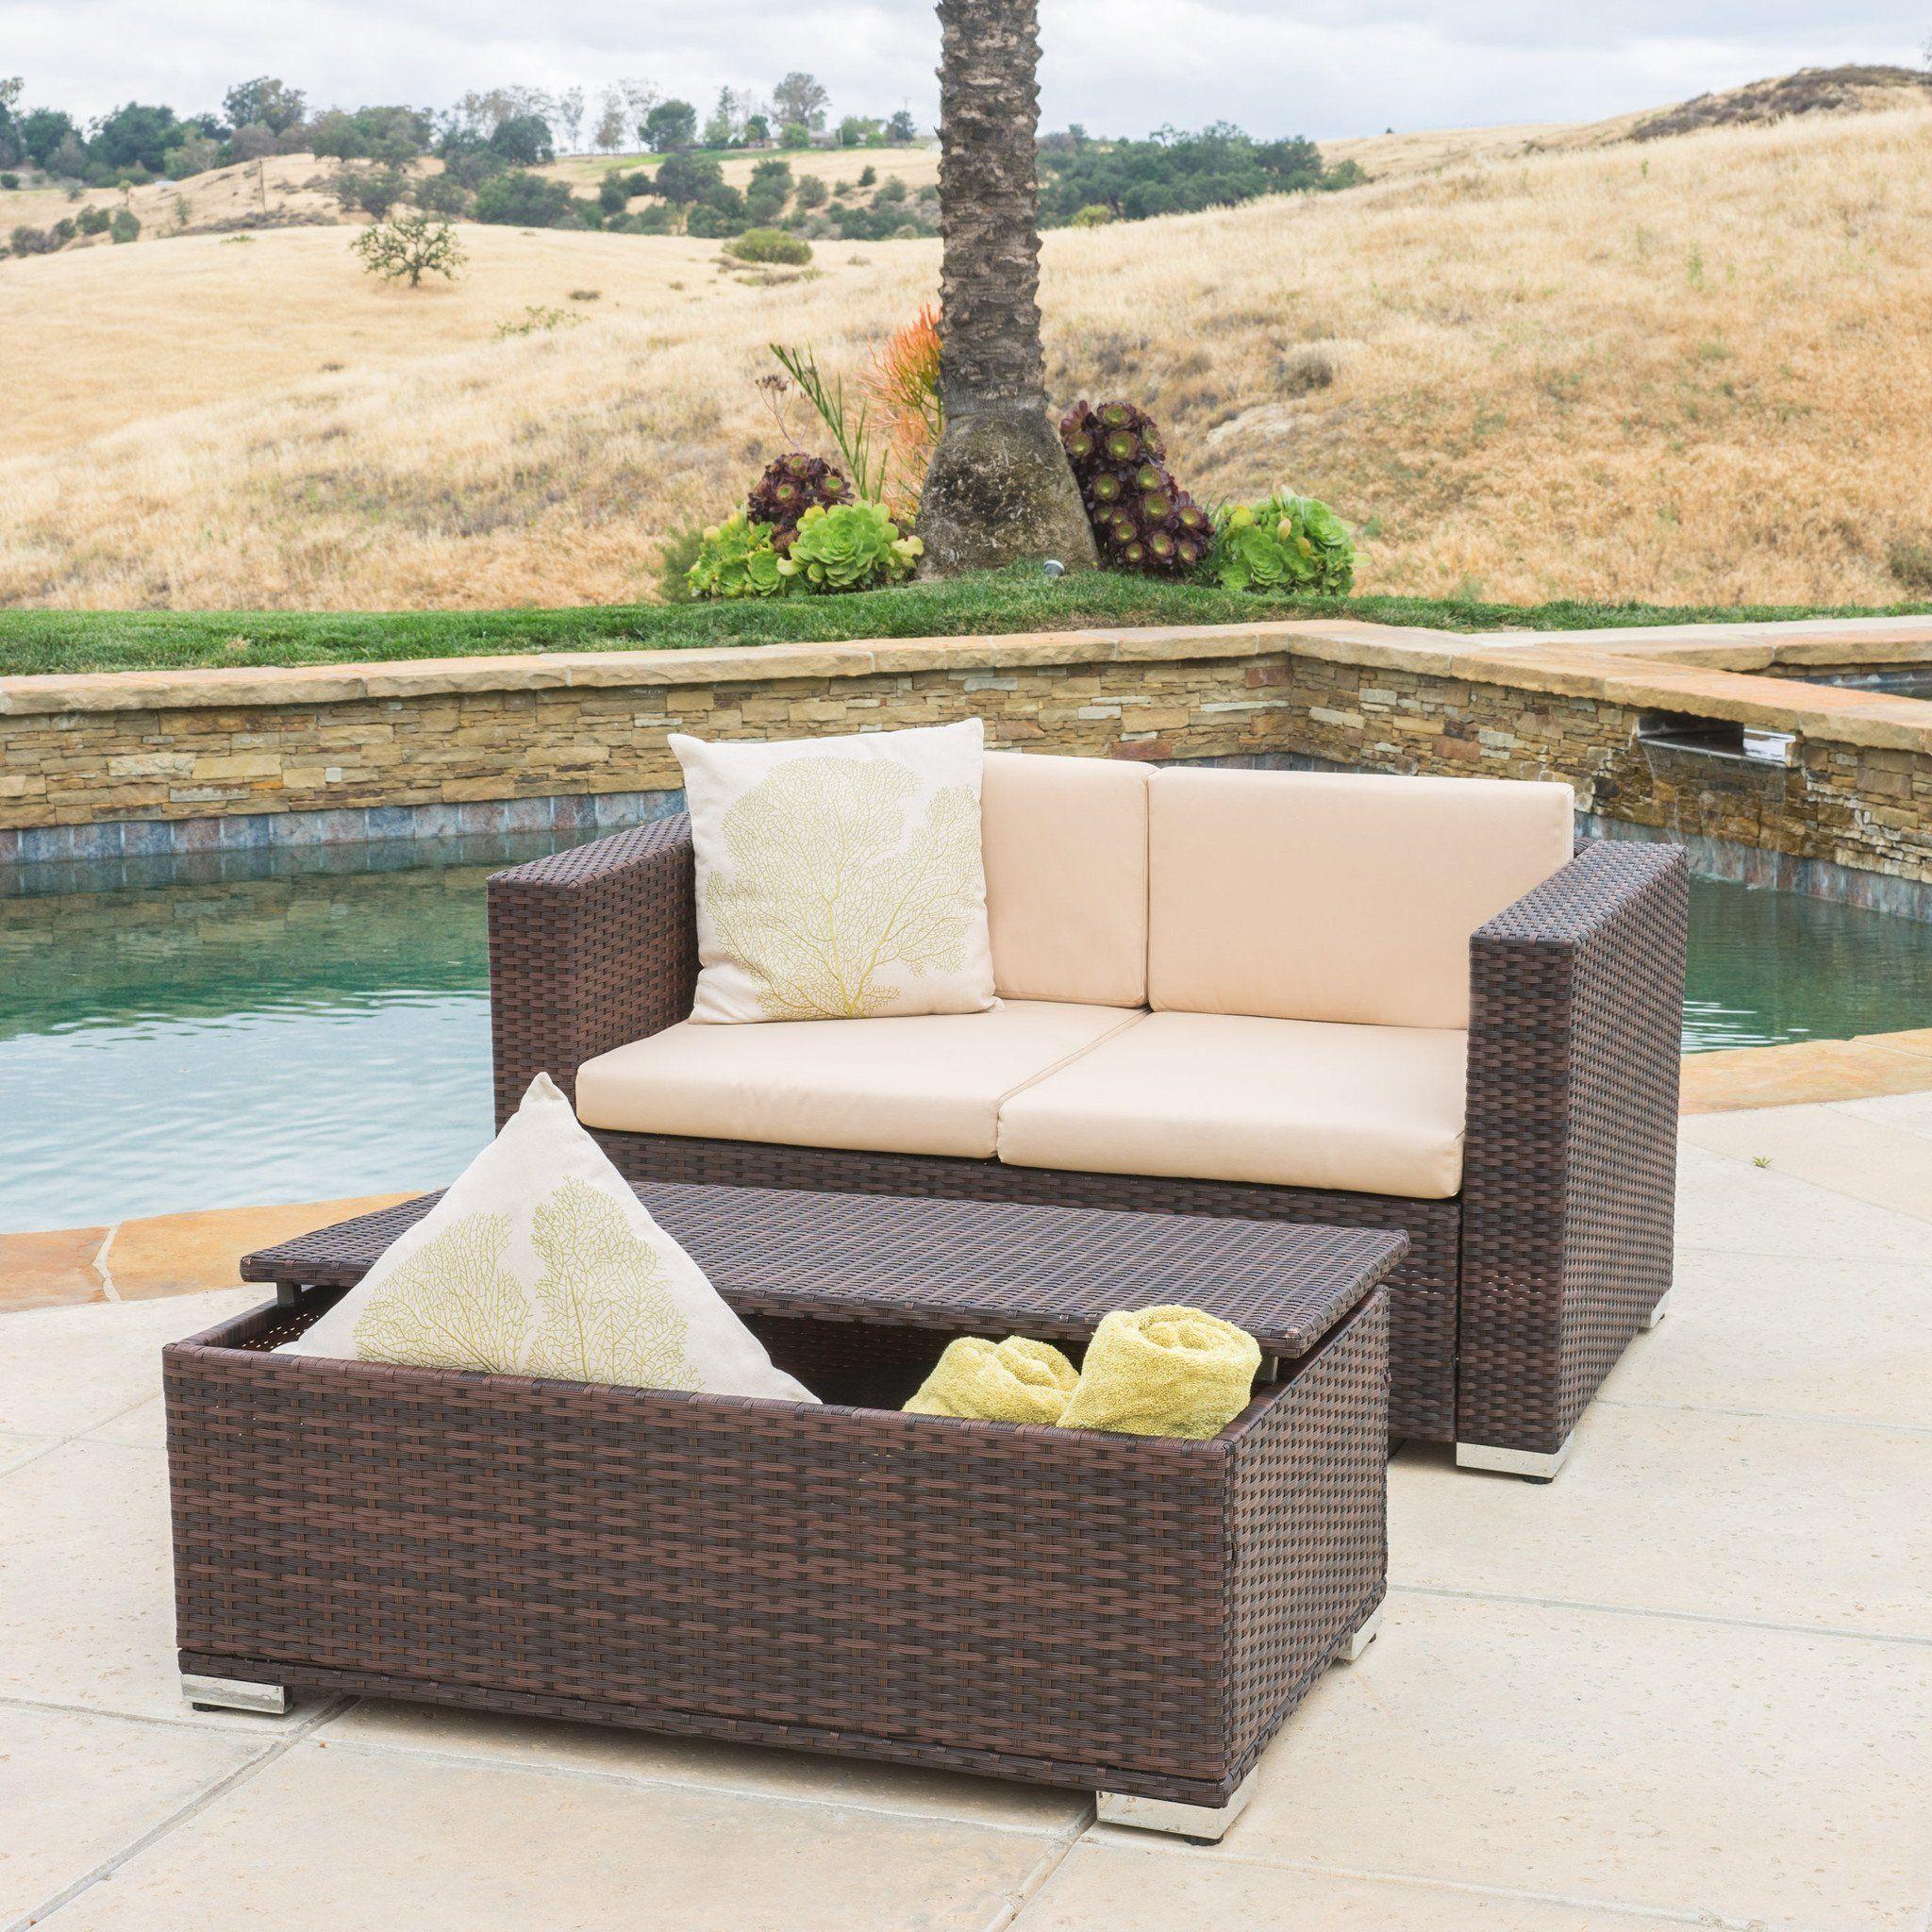 Westlake Outdoor Brown Pe Wicker Loveseat Ottoman Set Patio Sofa Set Conversation Set Patio Wicker Loveseat